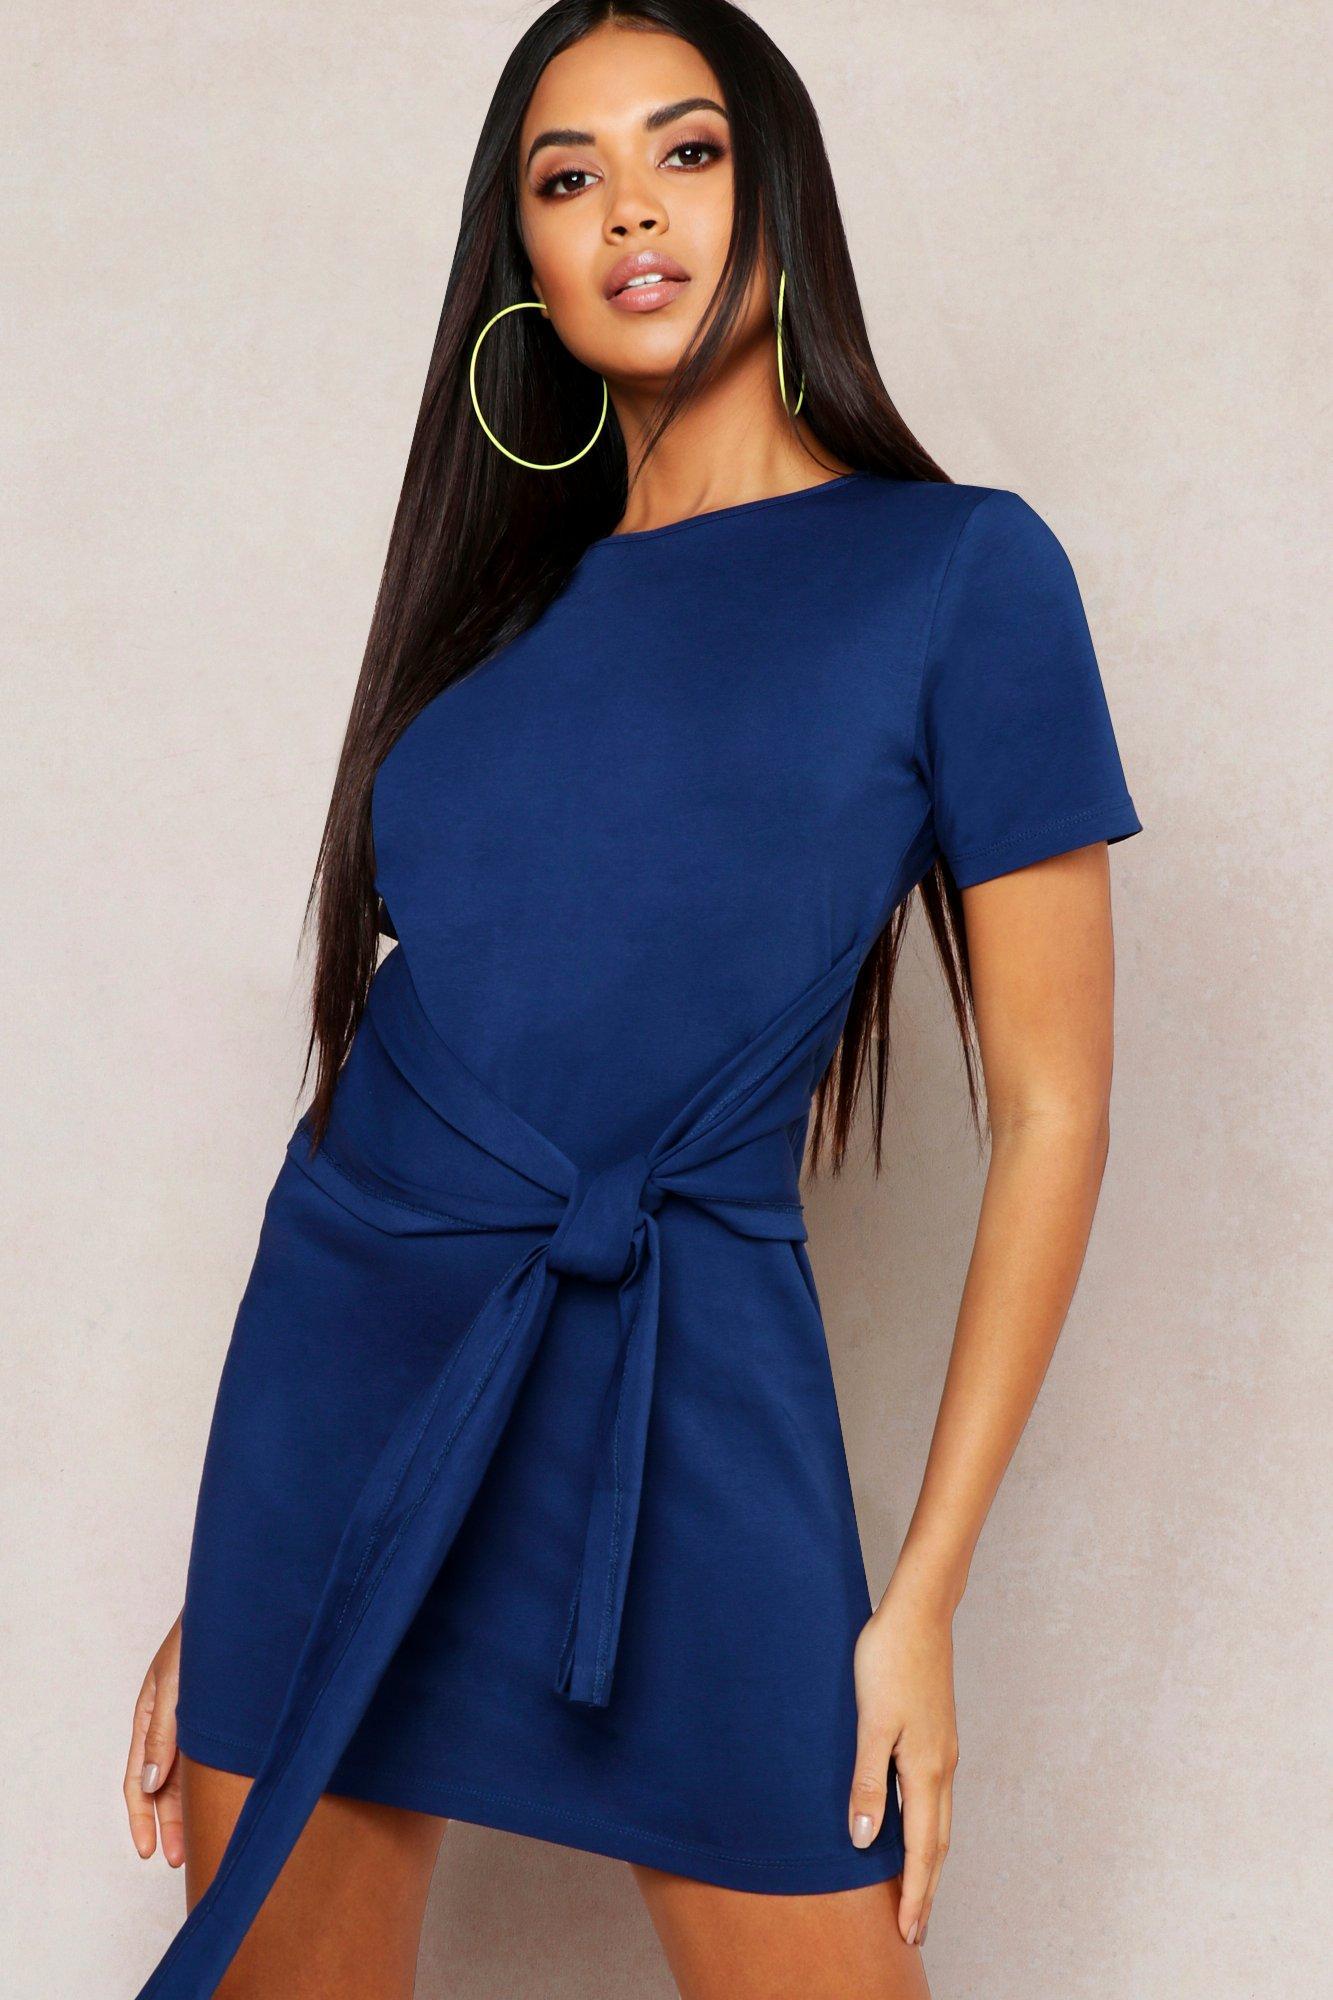 Womens T-Shirt-Kleid mit Taillenbindung - Denimblau - 50, Denimblau - Boohoo.com